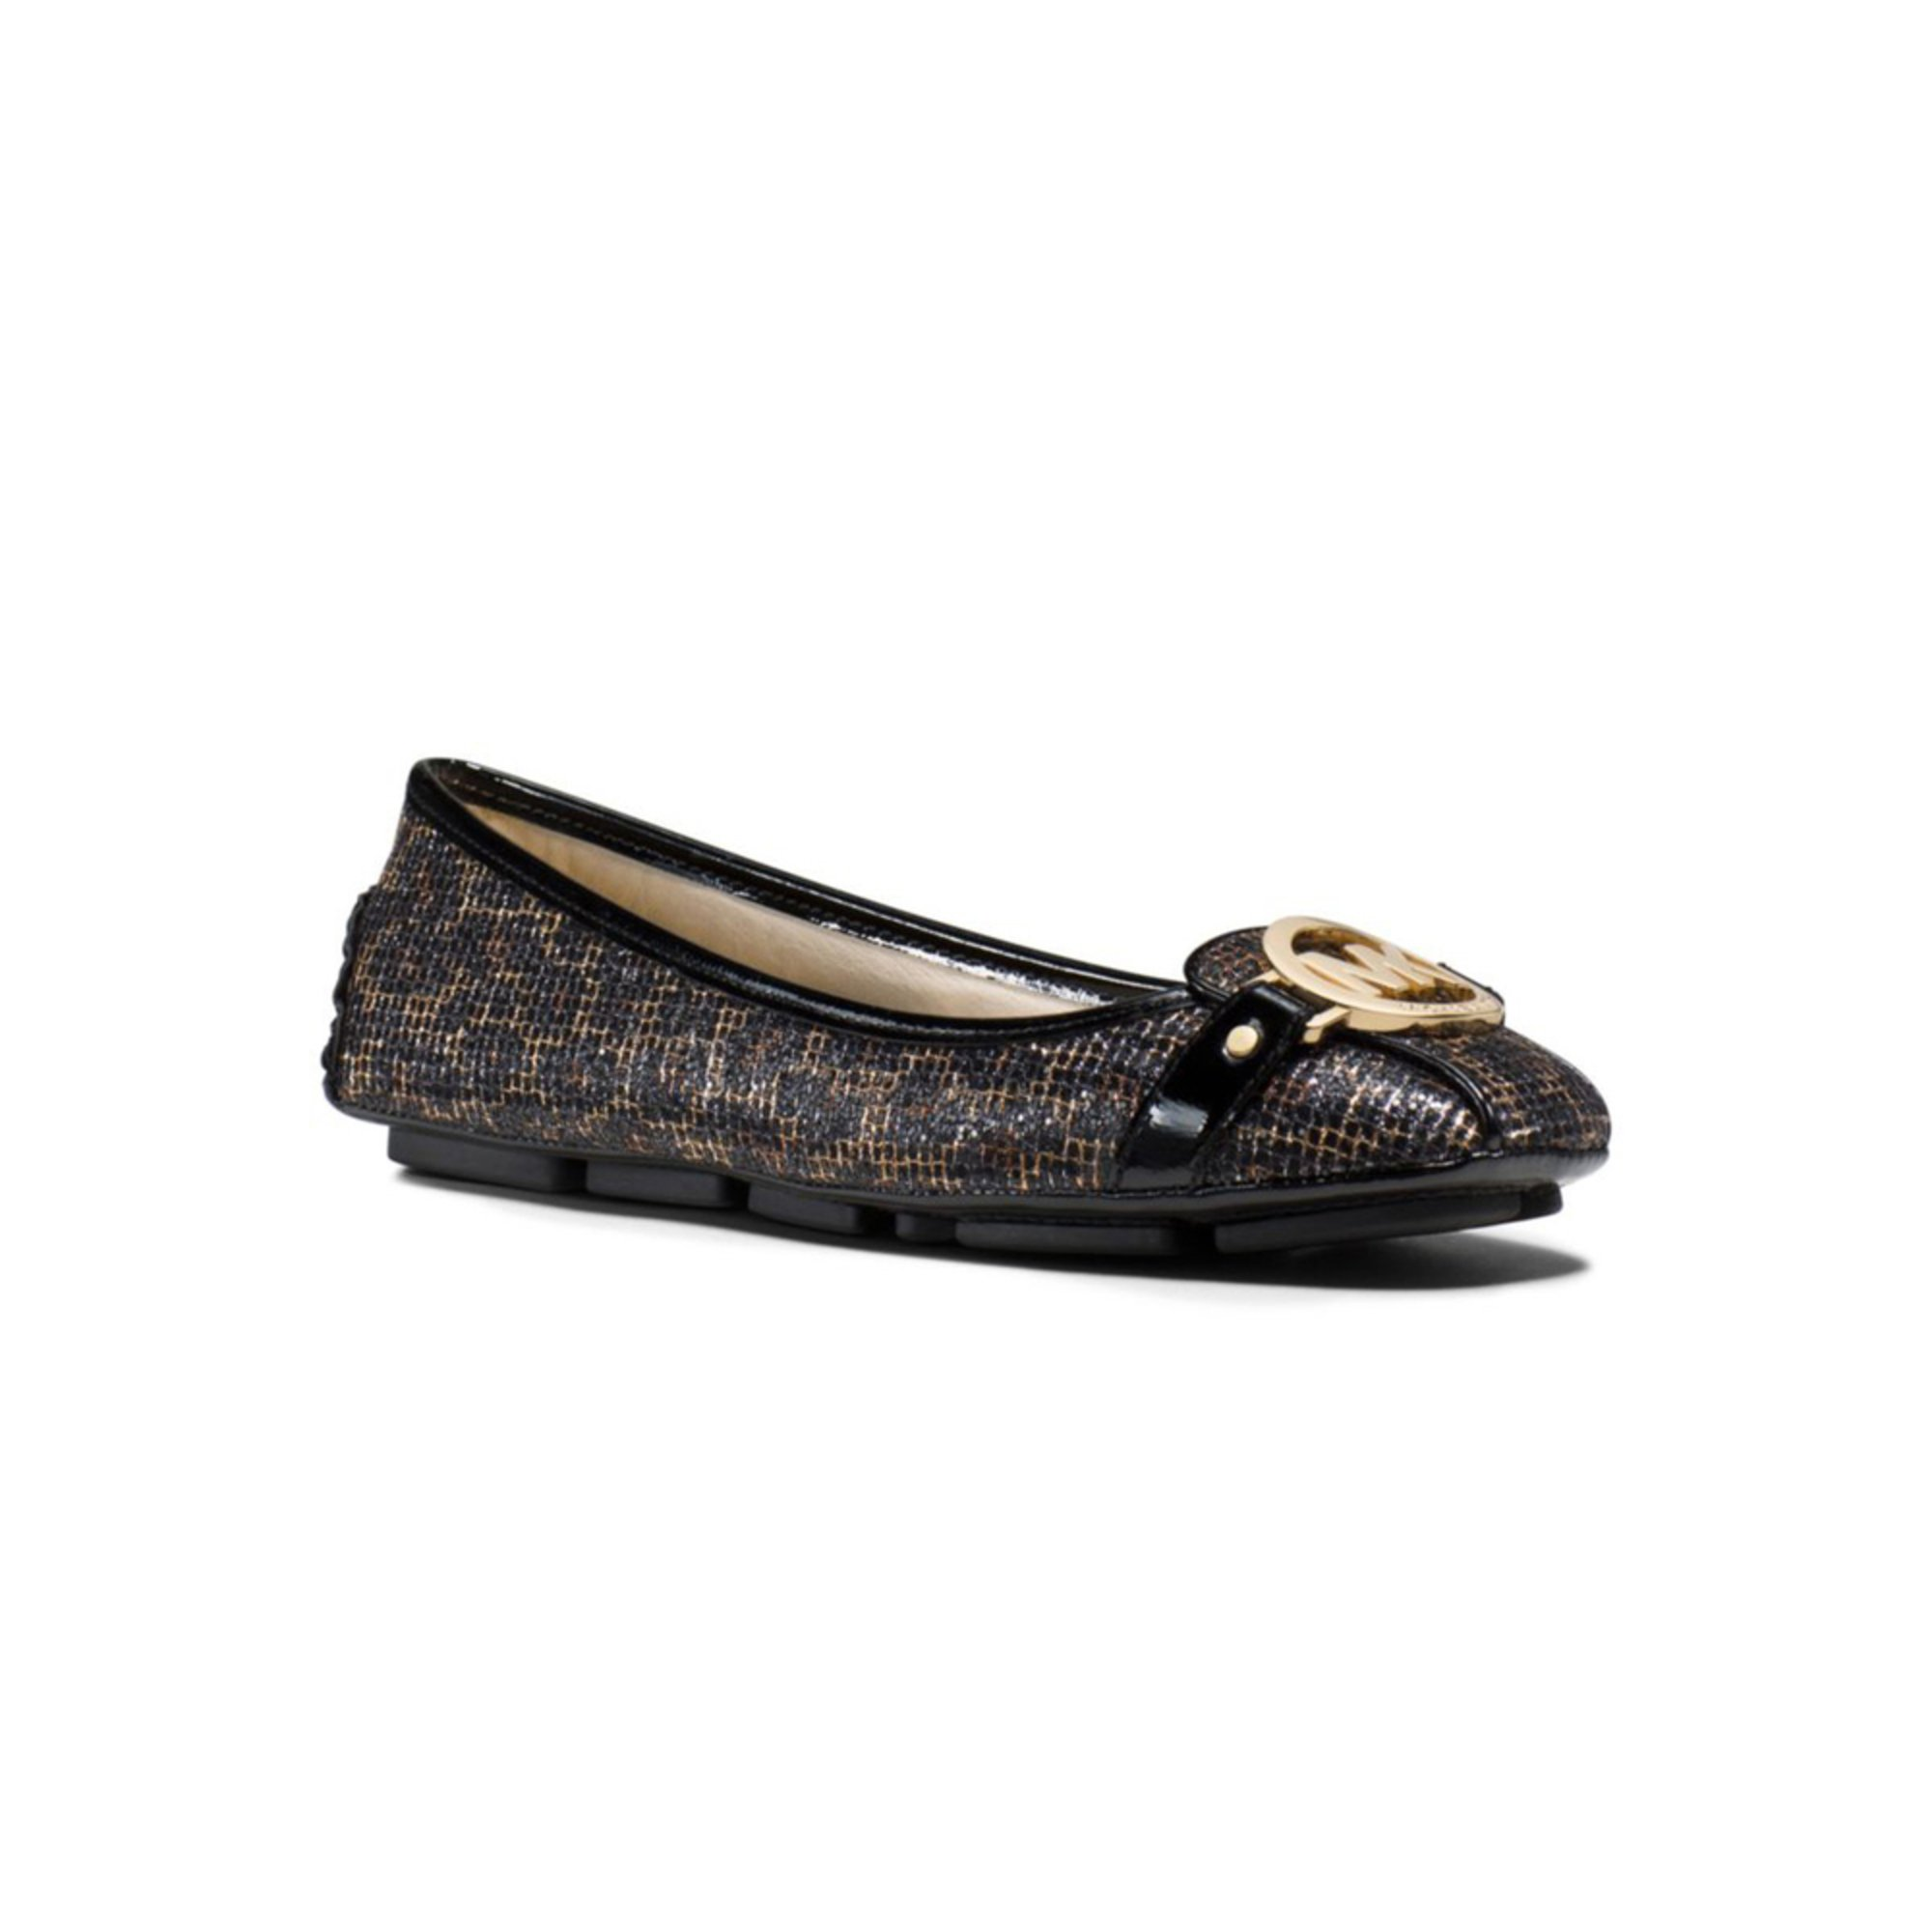 michael kors fulton moc s slip on shoe glitter